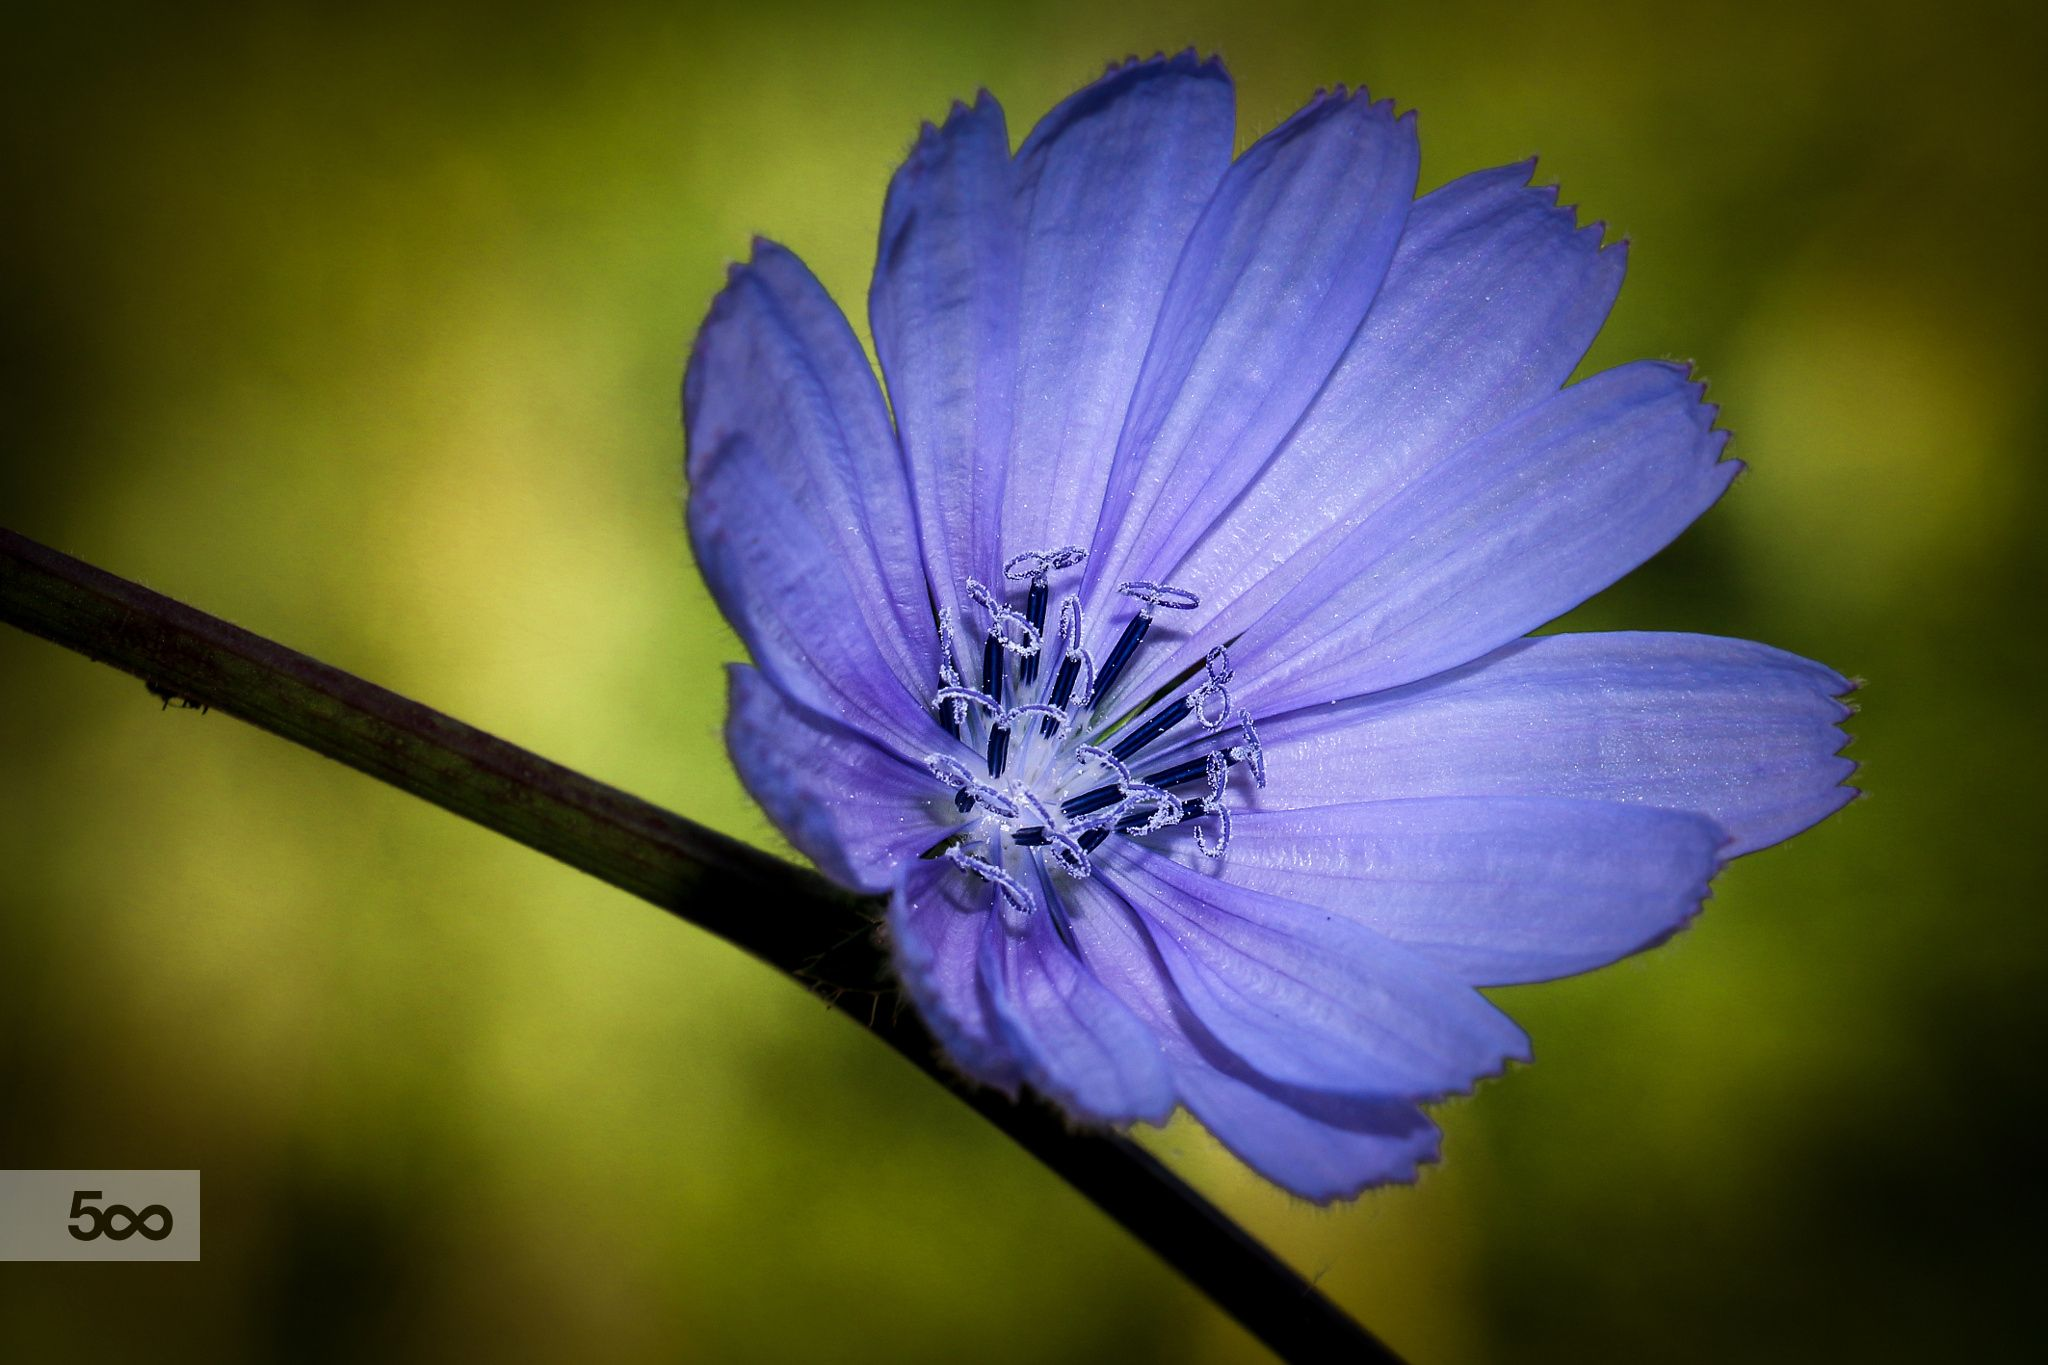 un fiore by stefano giacomini on 500px